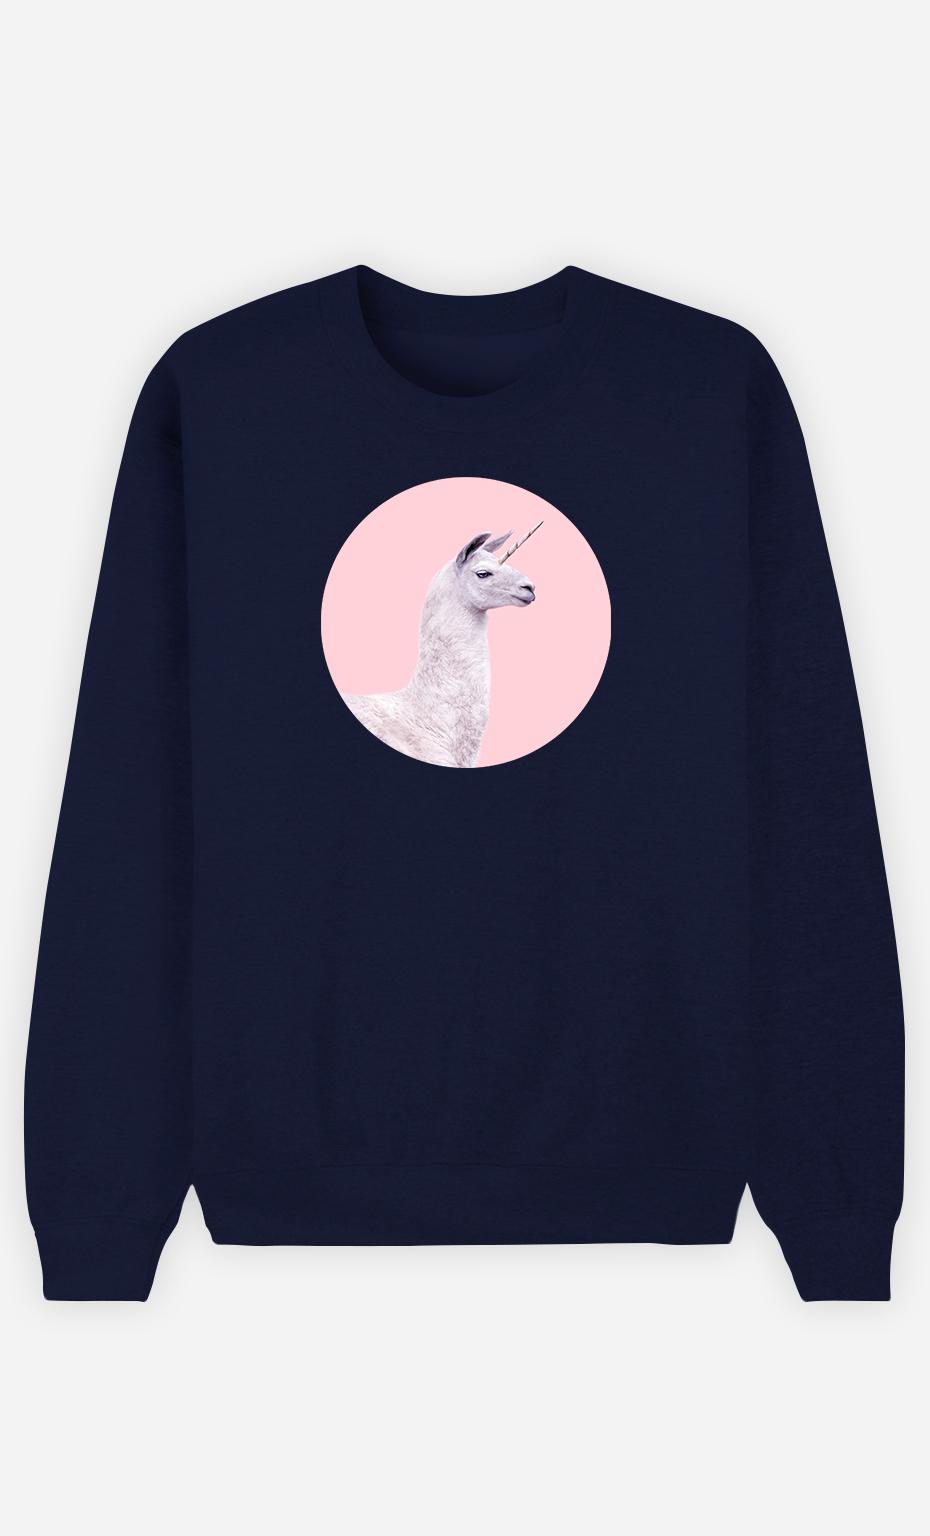 Sweatshirt Homme Unicorn Lama